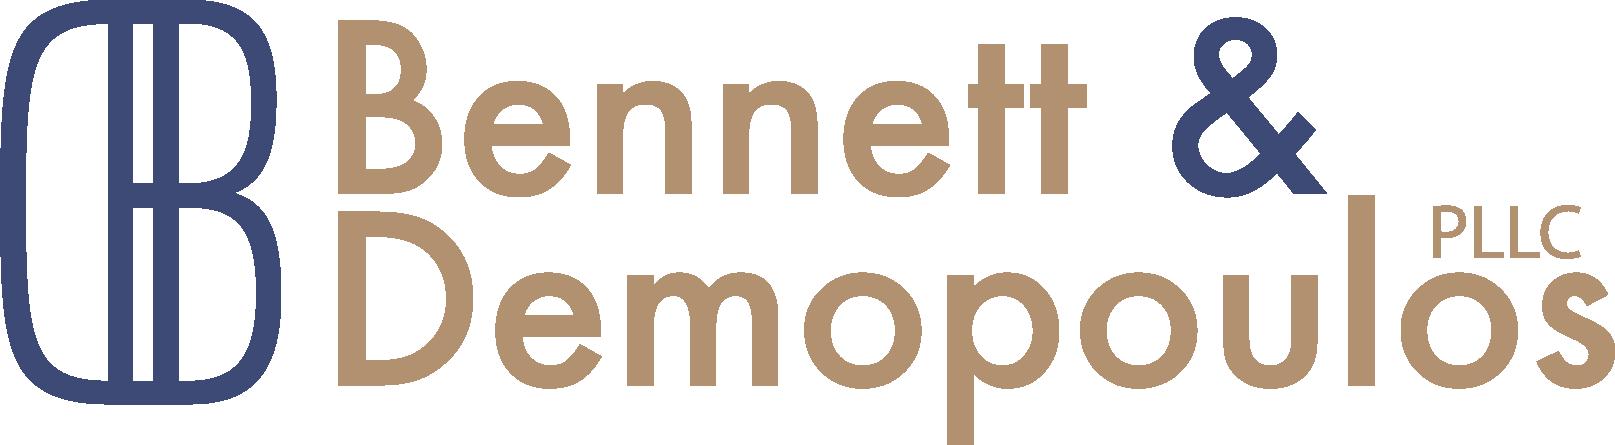 Bennett & Demopoulos Logo